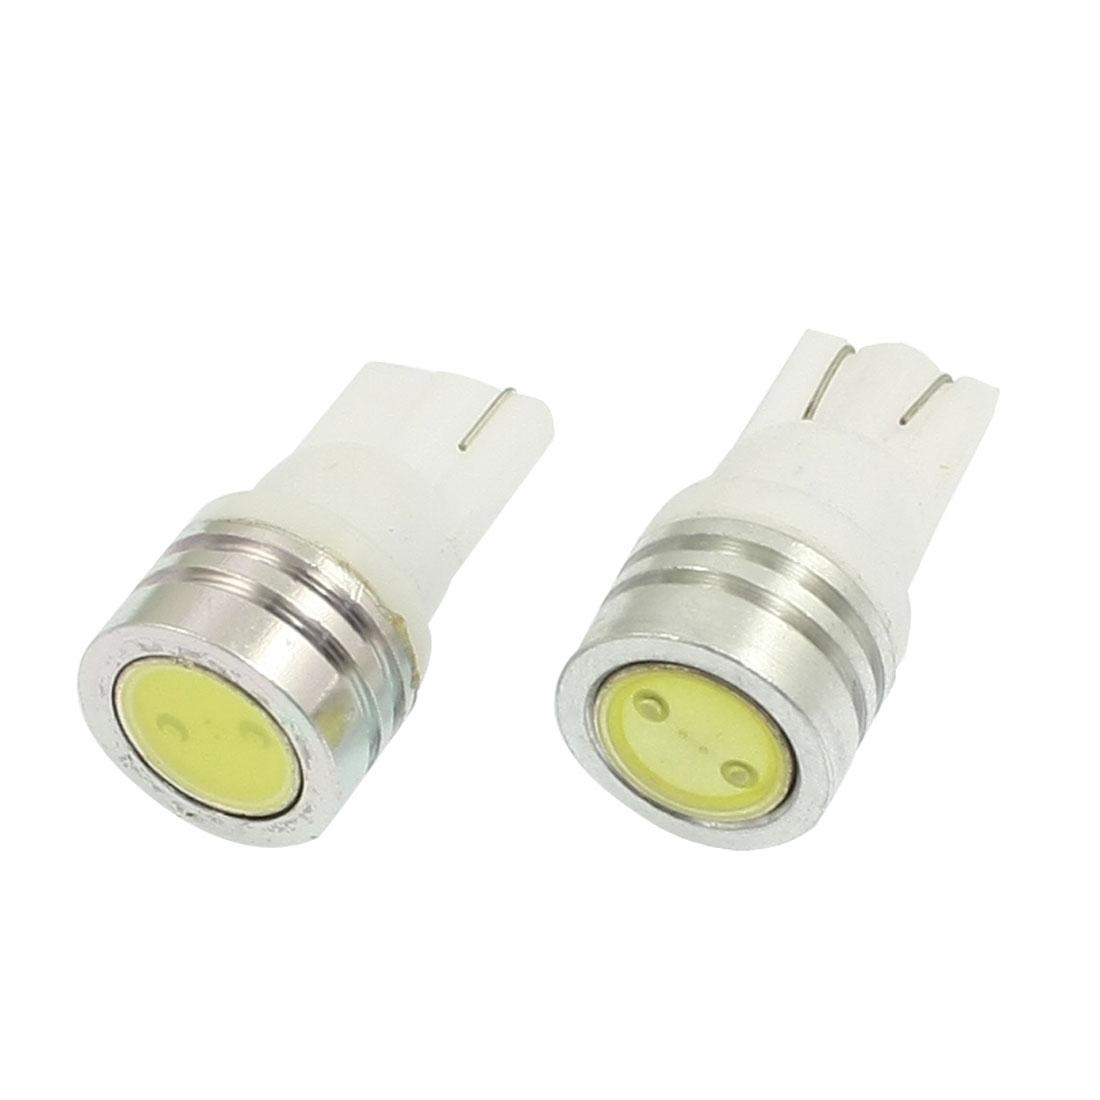 2 Pcs 1W T10 LED Car Auto Interior Dome Wedge Side Light Lamp Bulb White